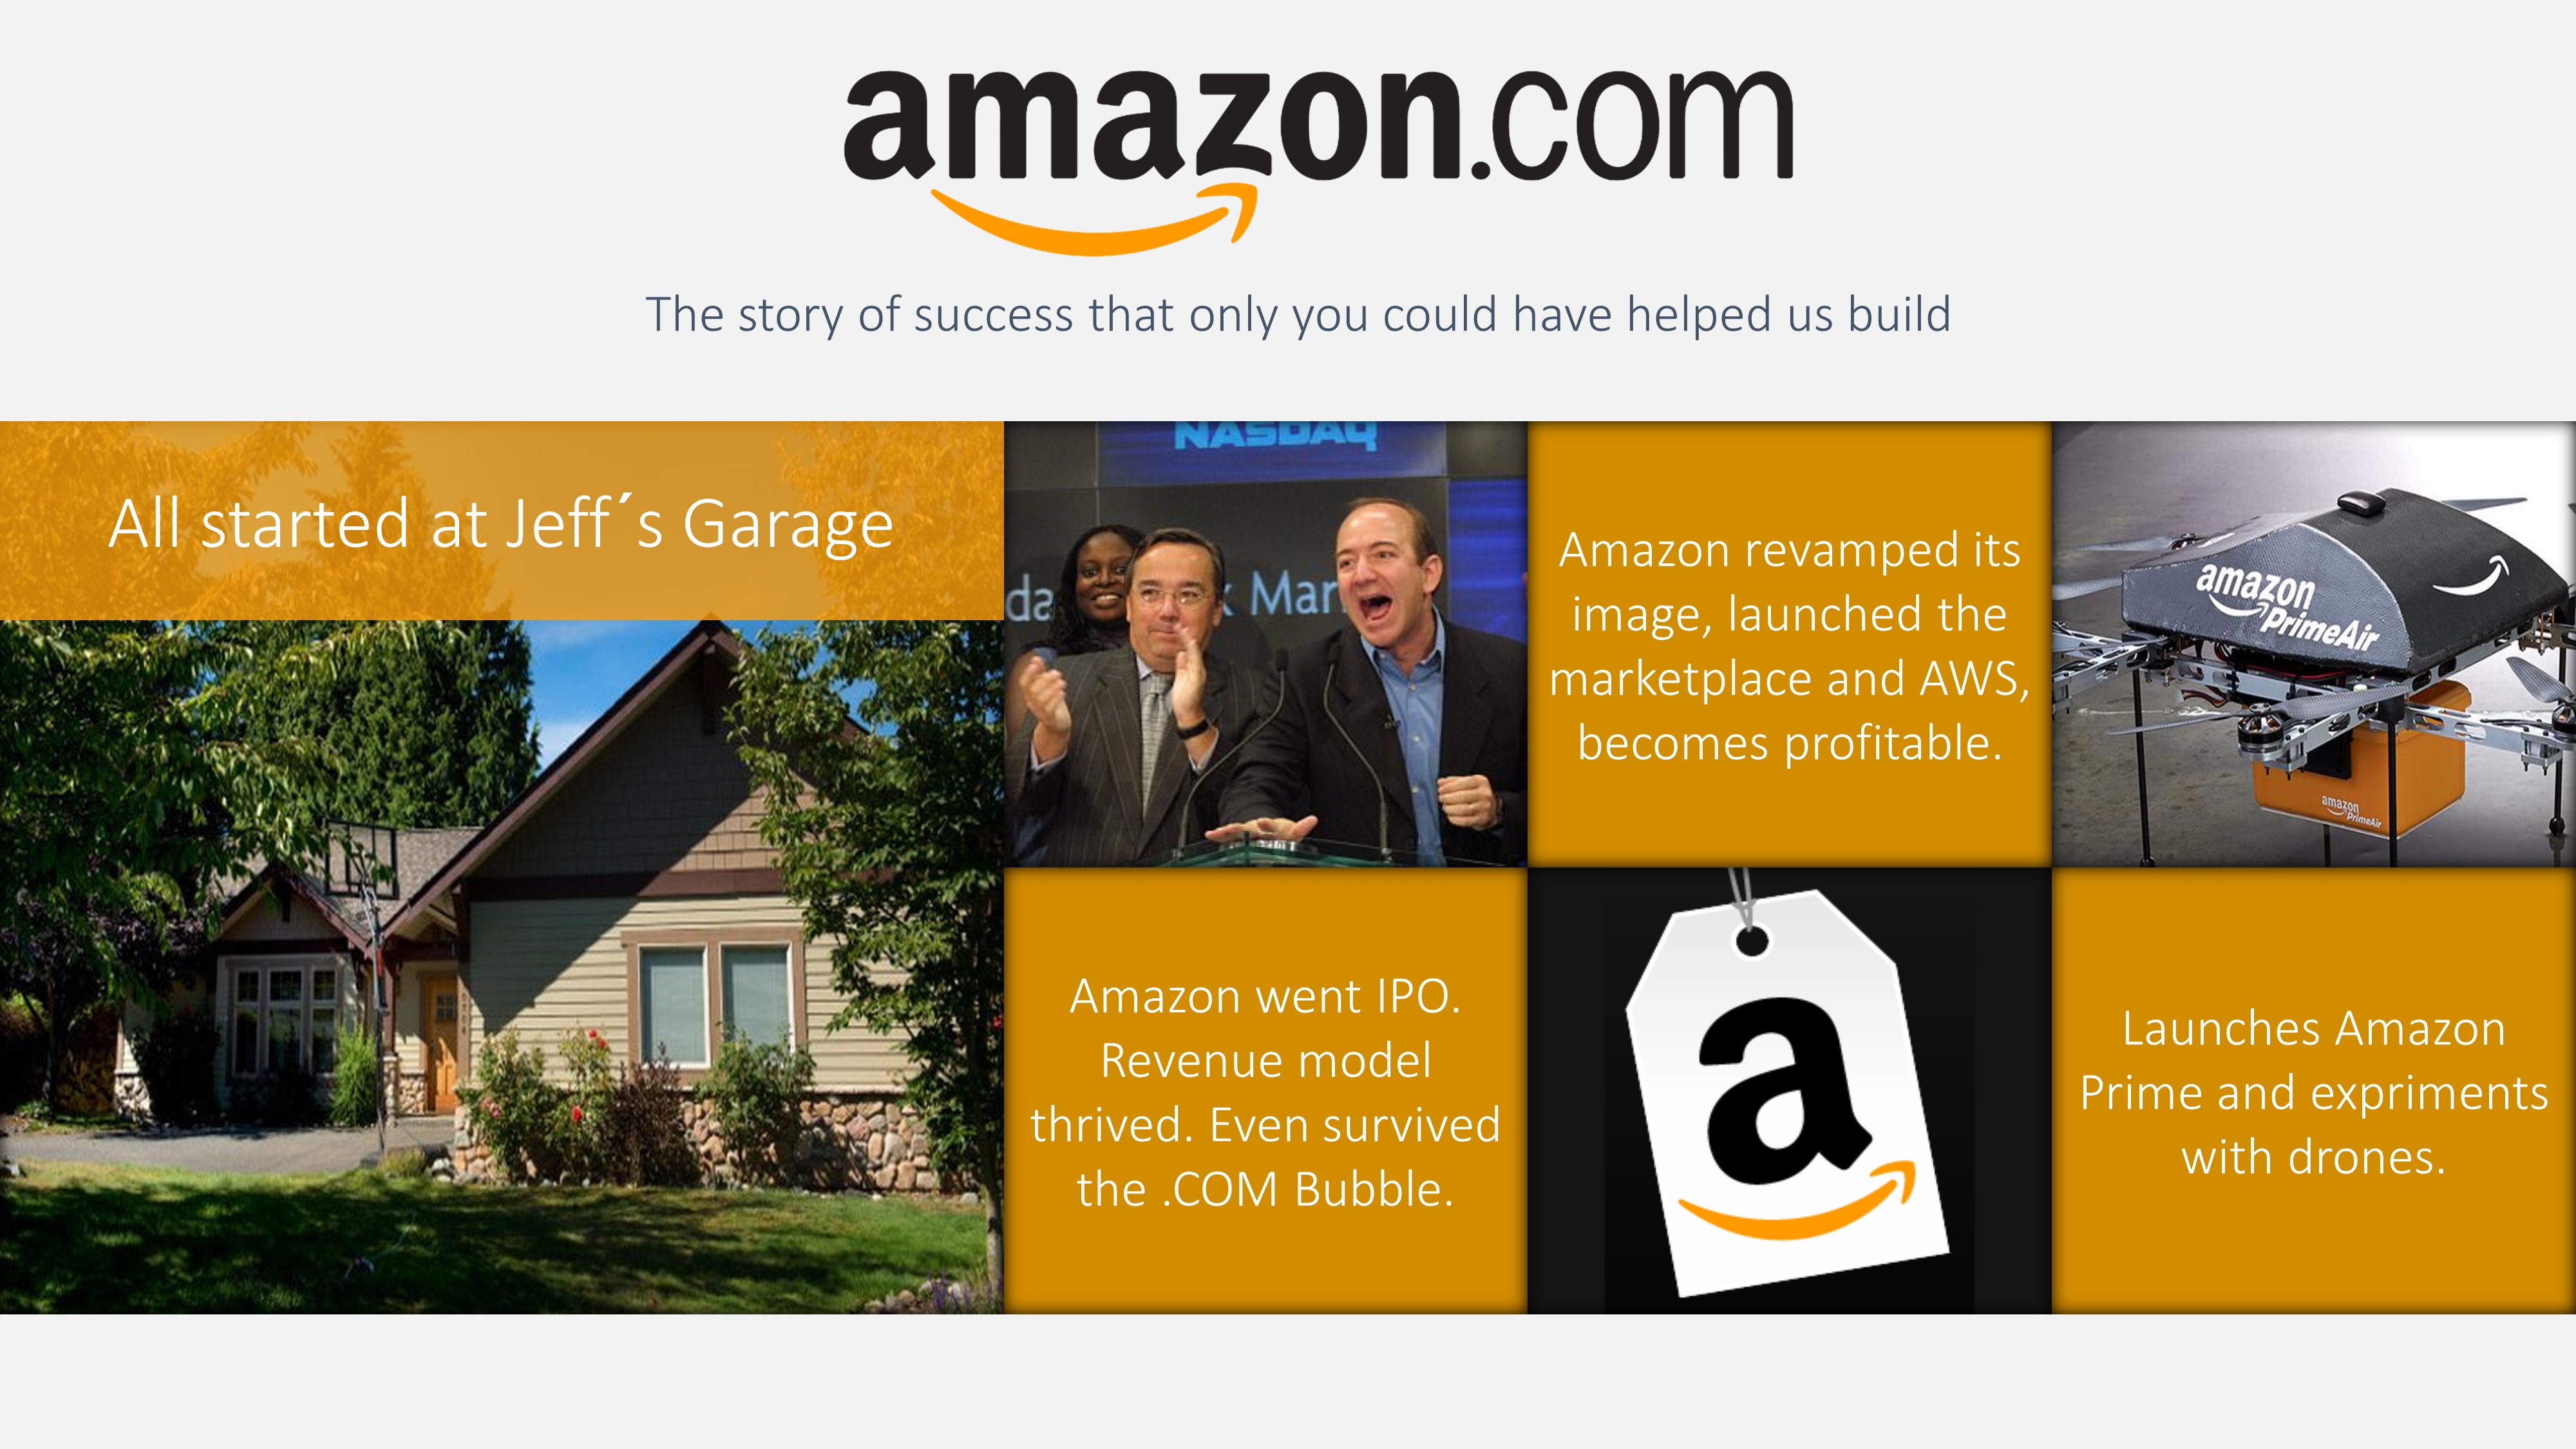 Amazon.com PowerPoint Presentation